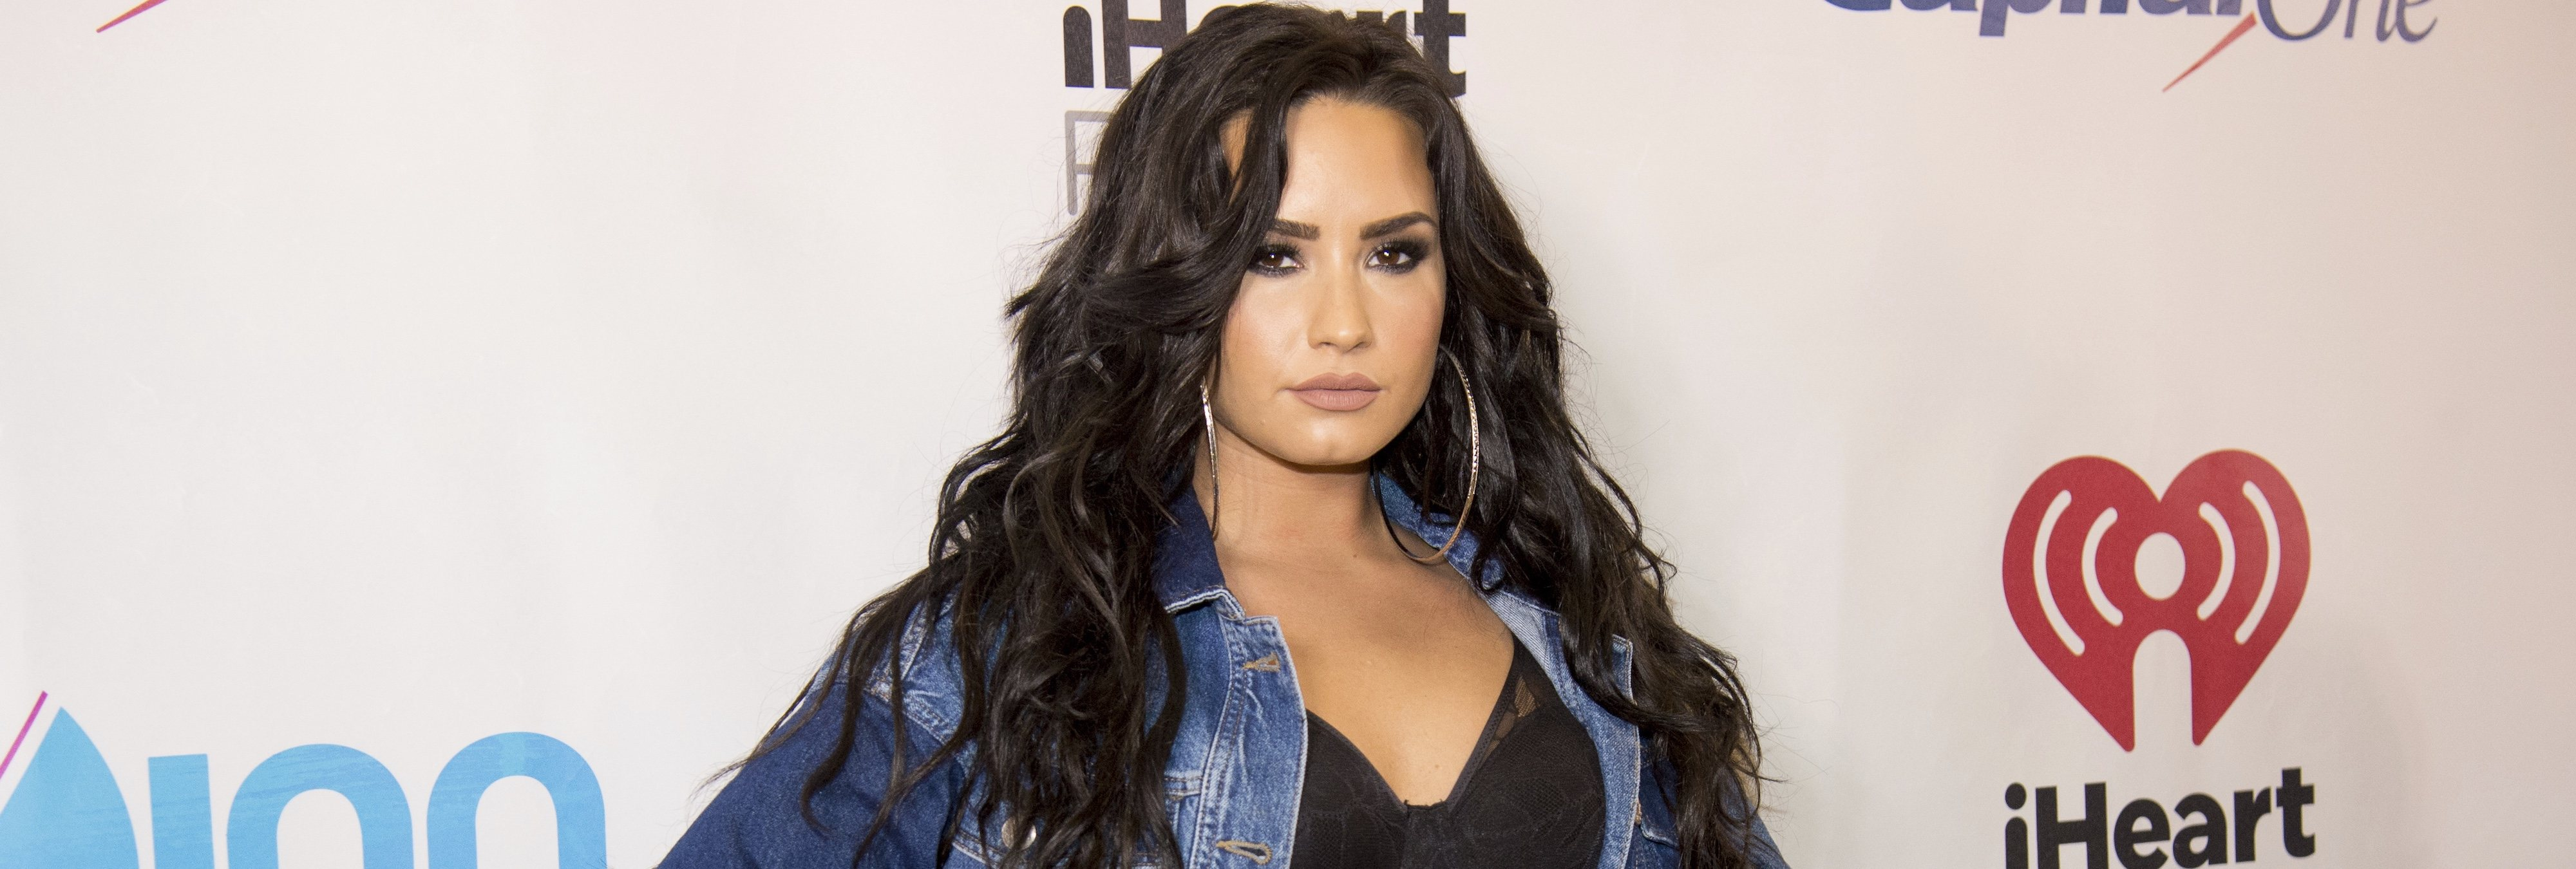 Demi Lovato revoluciona Instagram con su alegato a favor de las curvas